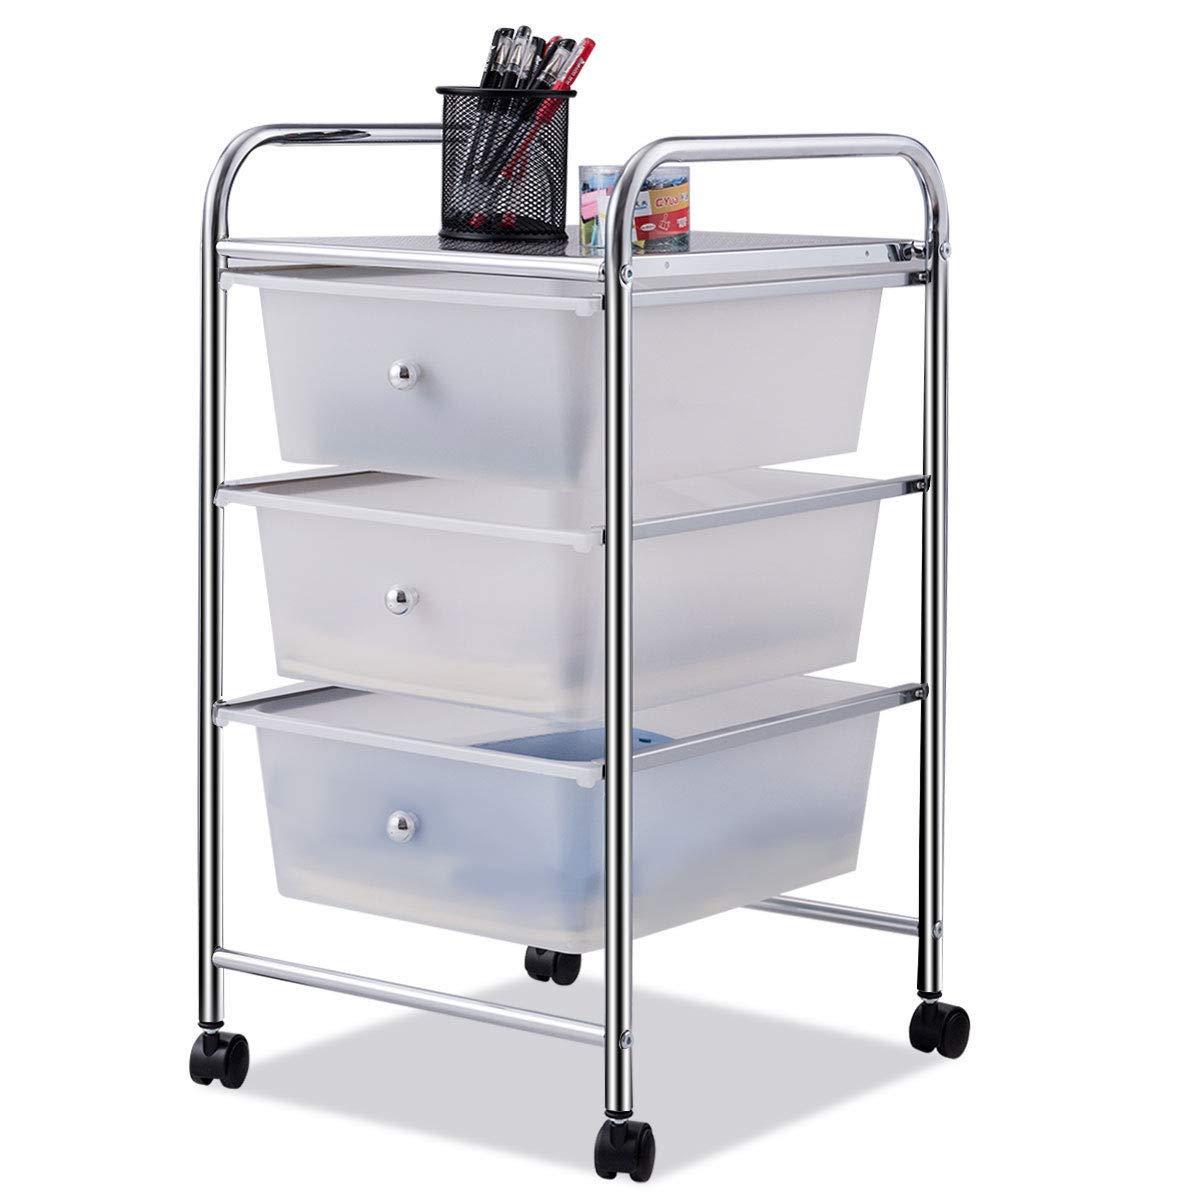 Giantex 3 Drawers Cart Storage Bin Organizer Rolling Storage Cart Metal Frame Plastic Drawers Flexible Wheels Home Office Scrapbook Supply & Paper Shelf, White